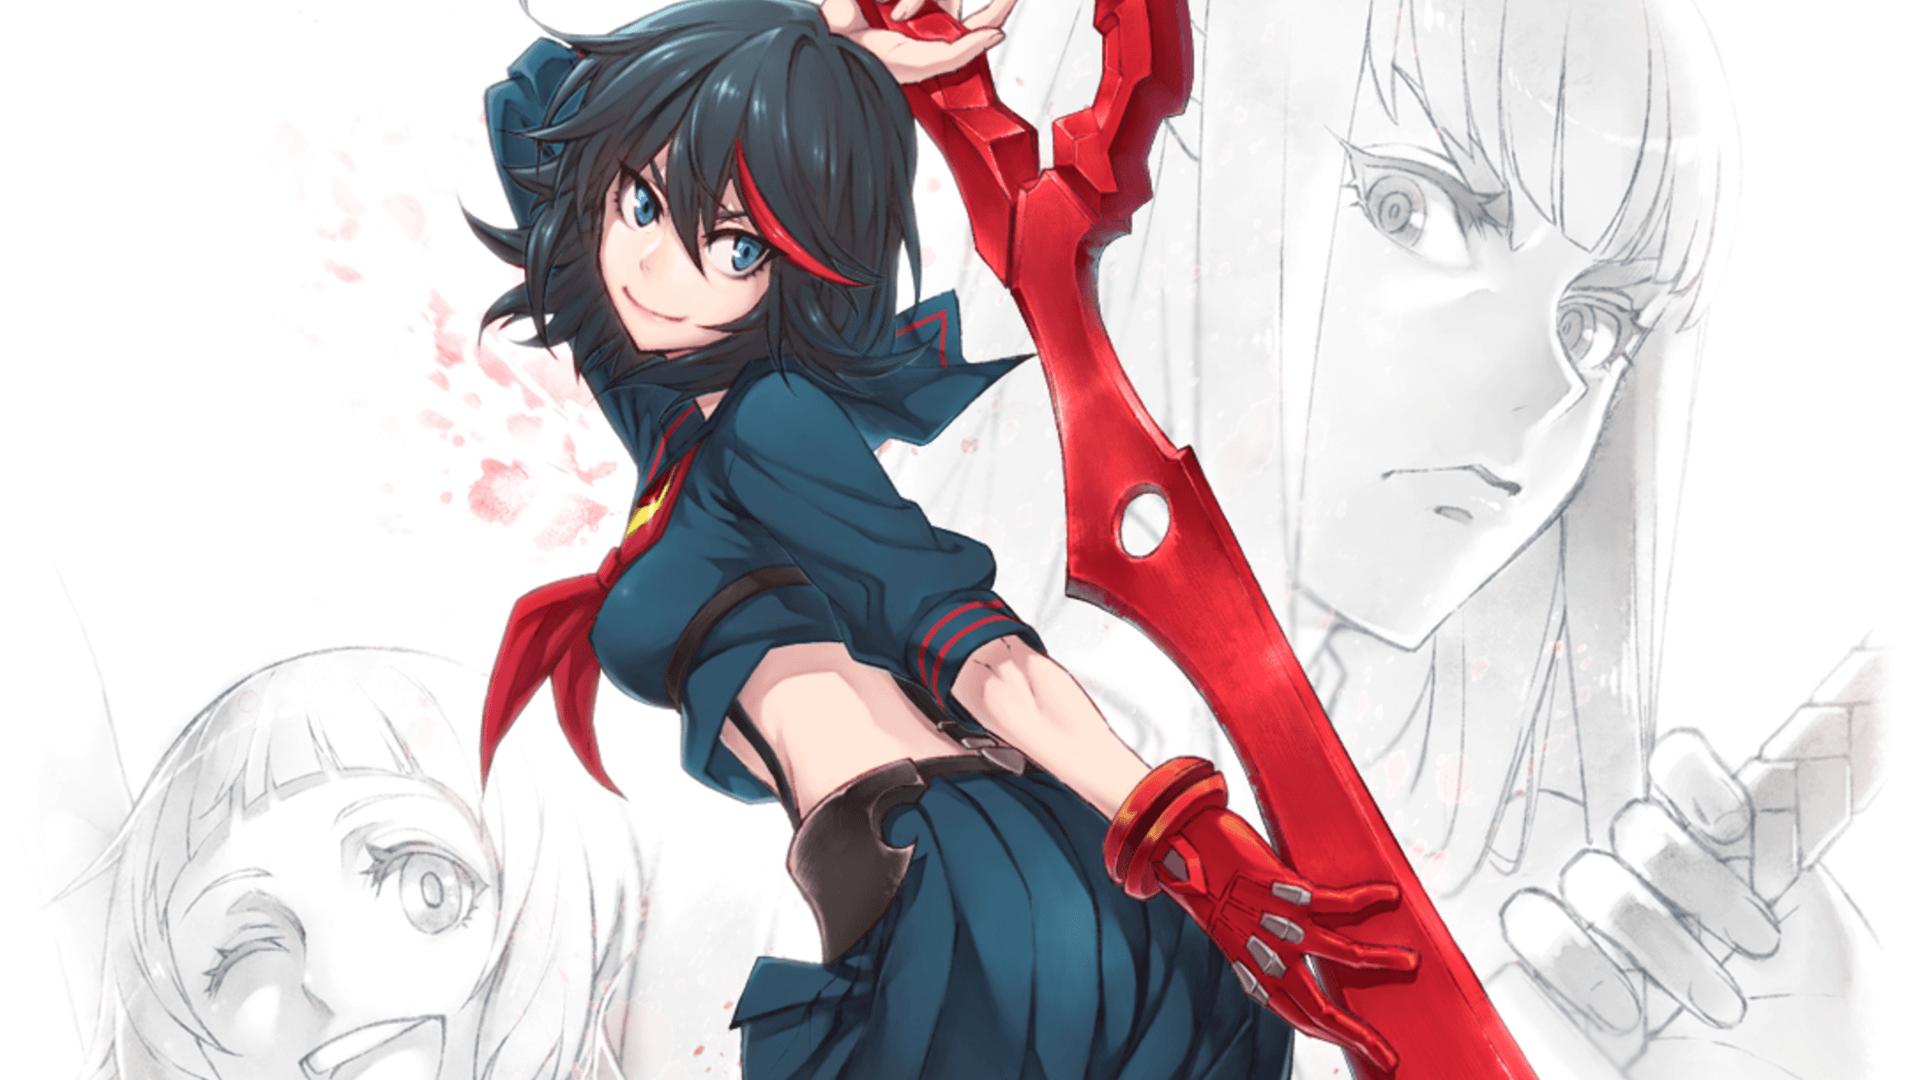 Kill La Kill Anime Wallpapers Top Free Kill La Kill Anime